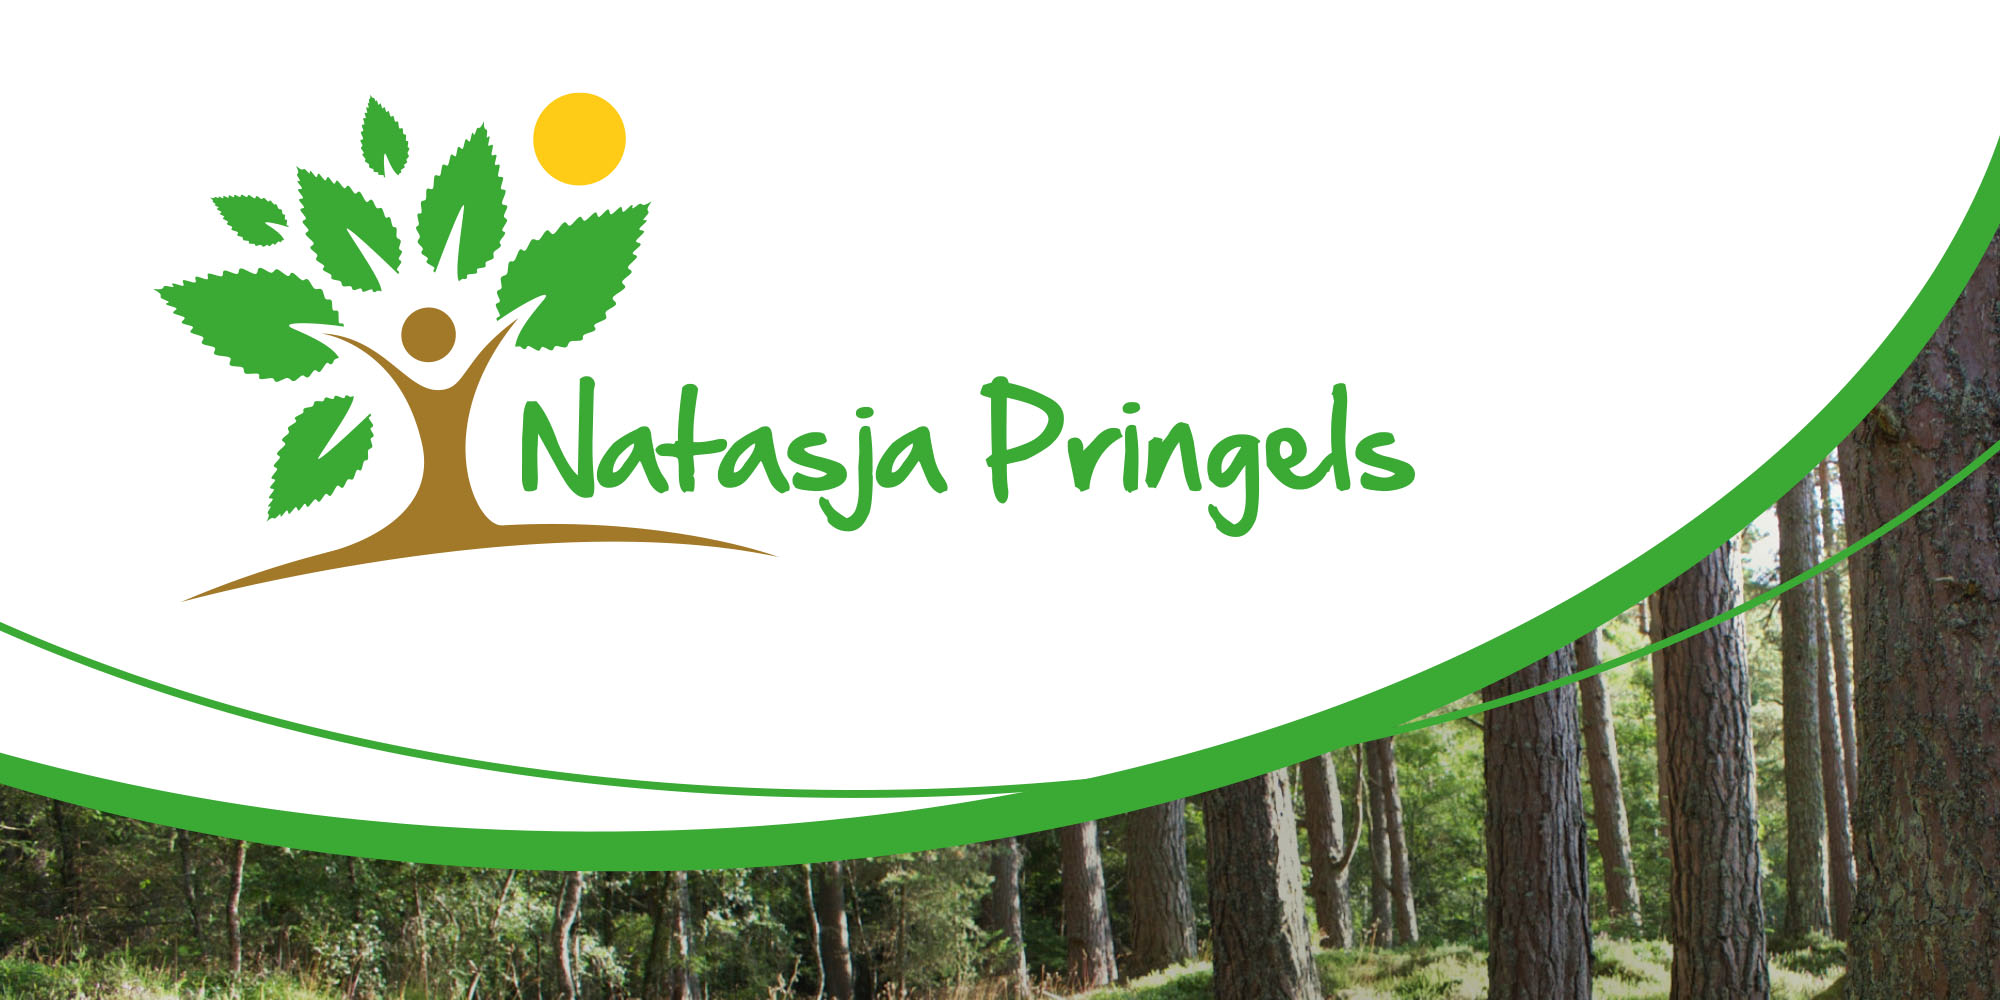 Logo - Natasja Pringels